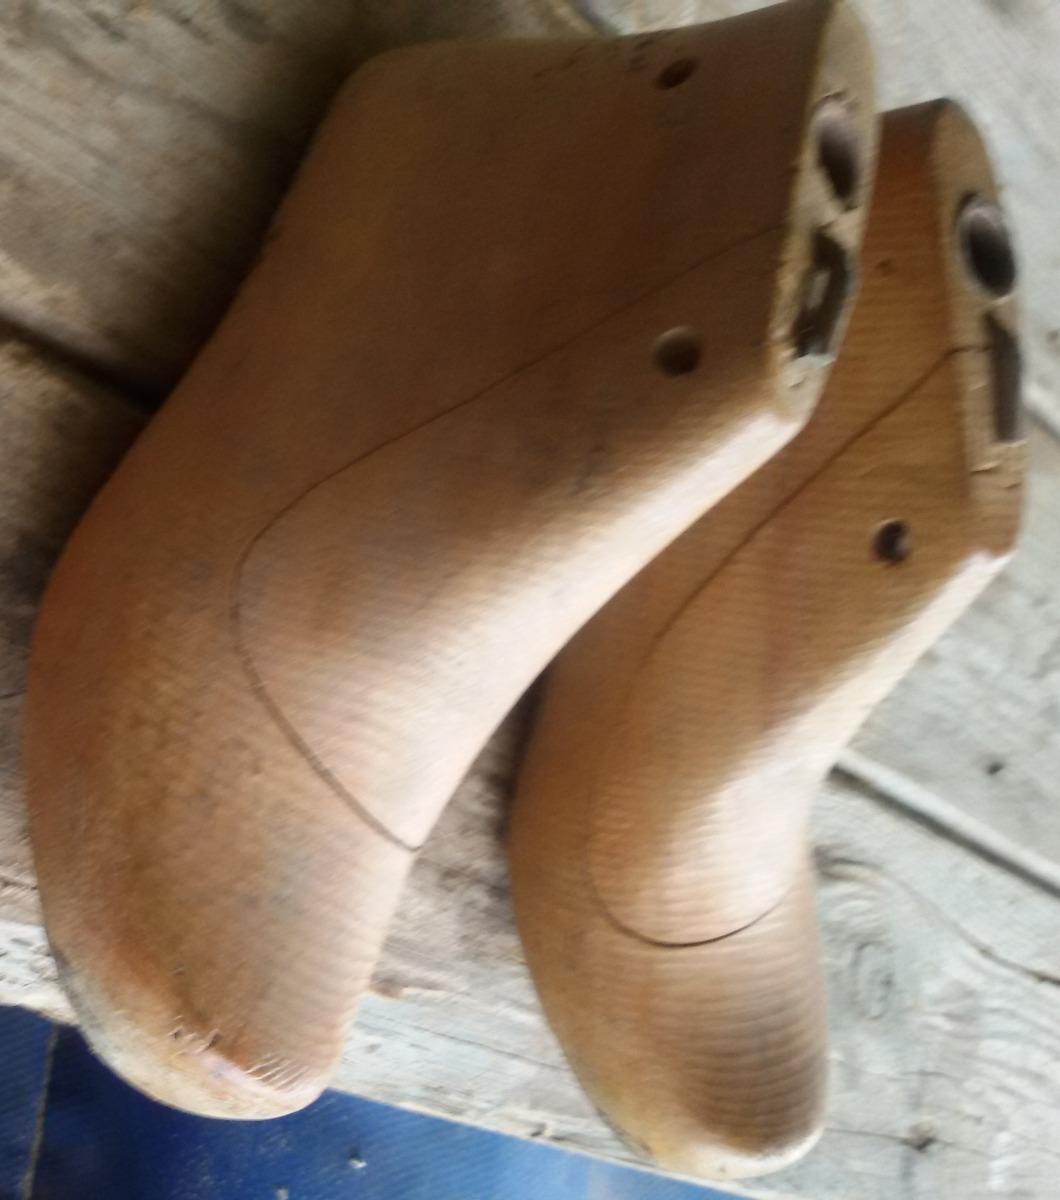 de8b3724 Pares Hormas De Zapatos De Madera Para Niños - $ 160,00 en Mercado Libre